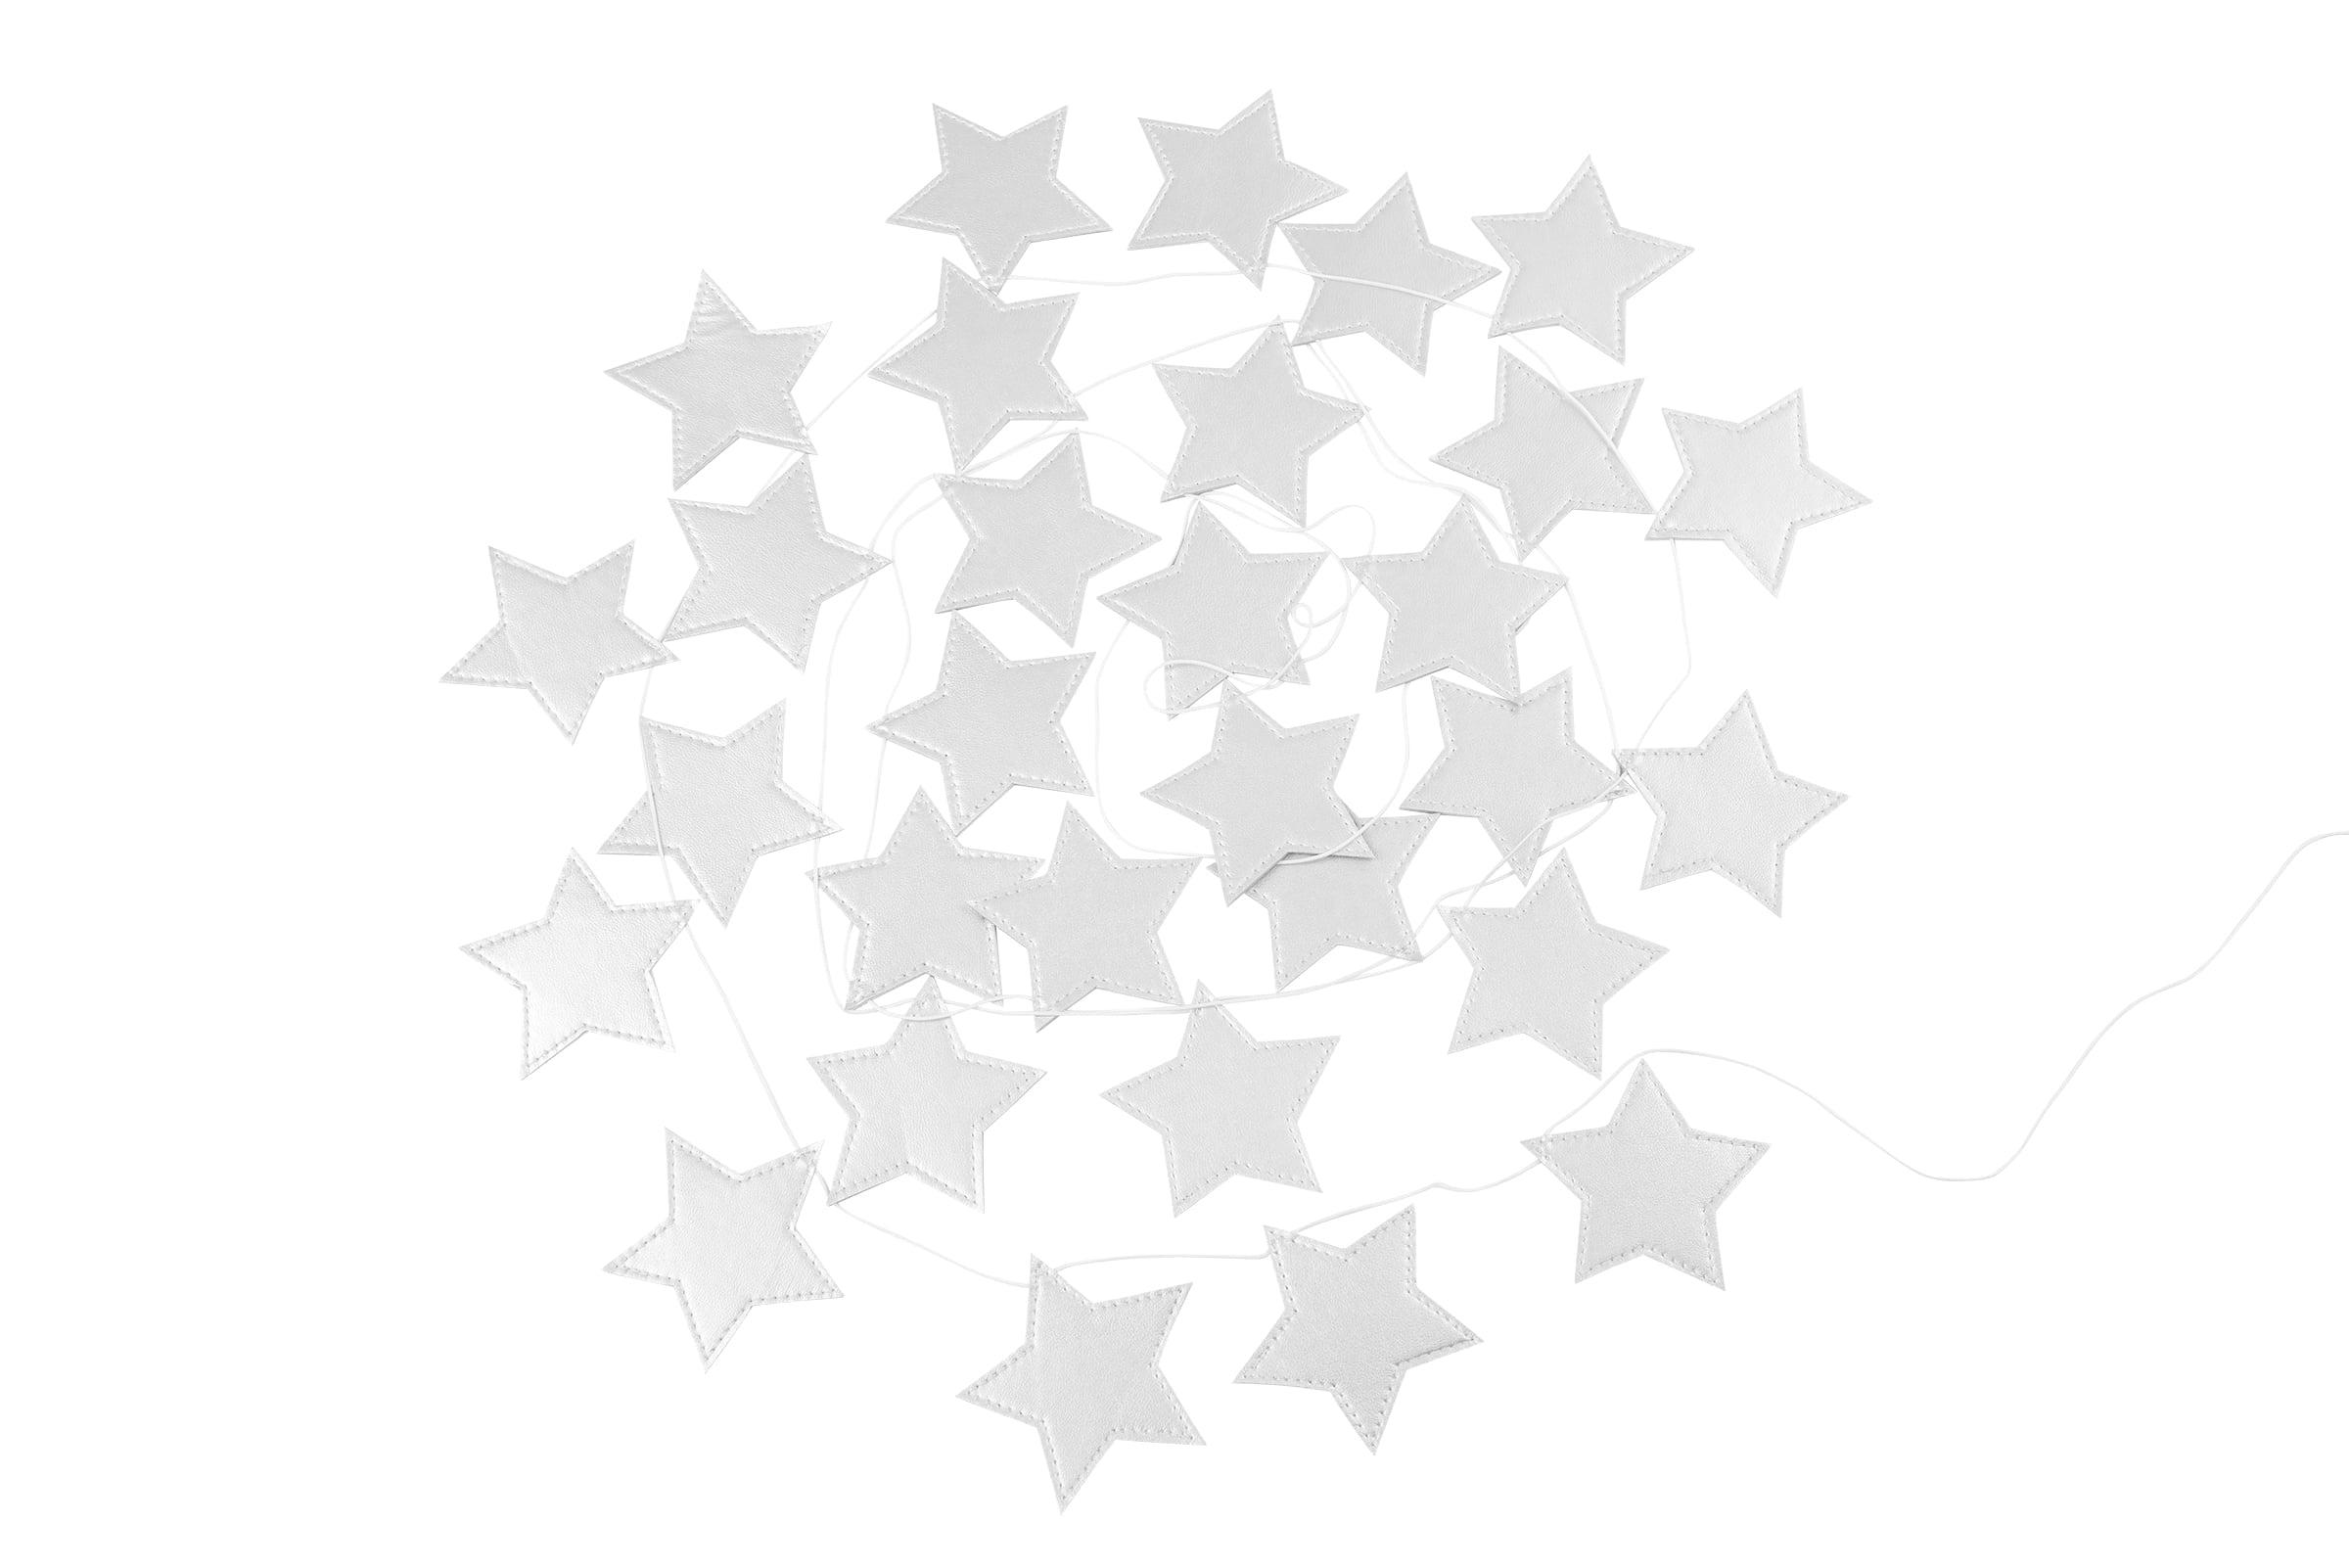 girlanda-hviezdy-stieborna-dadaboom-sk